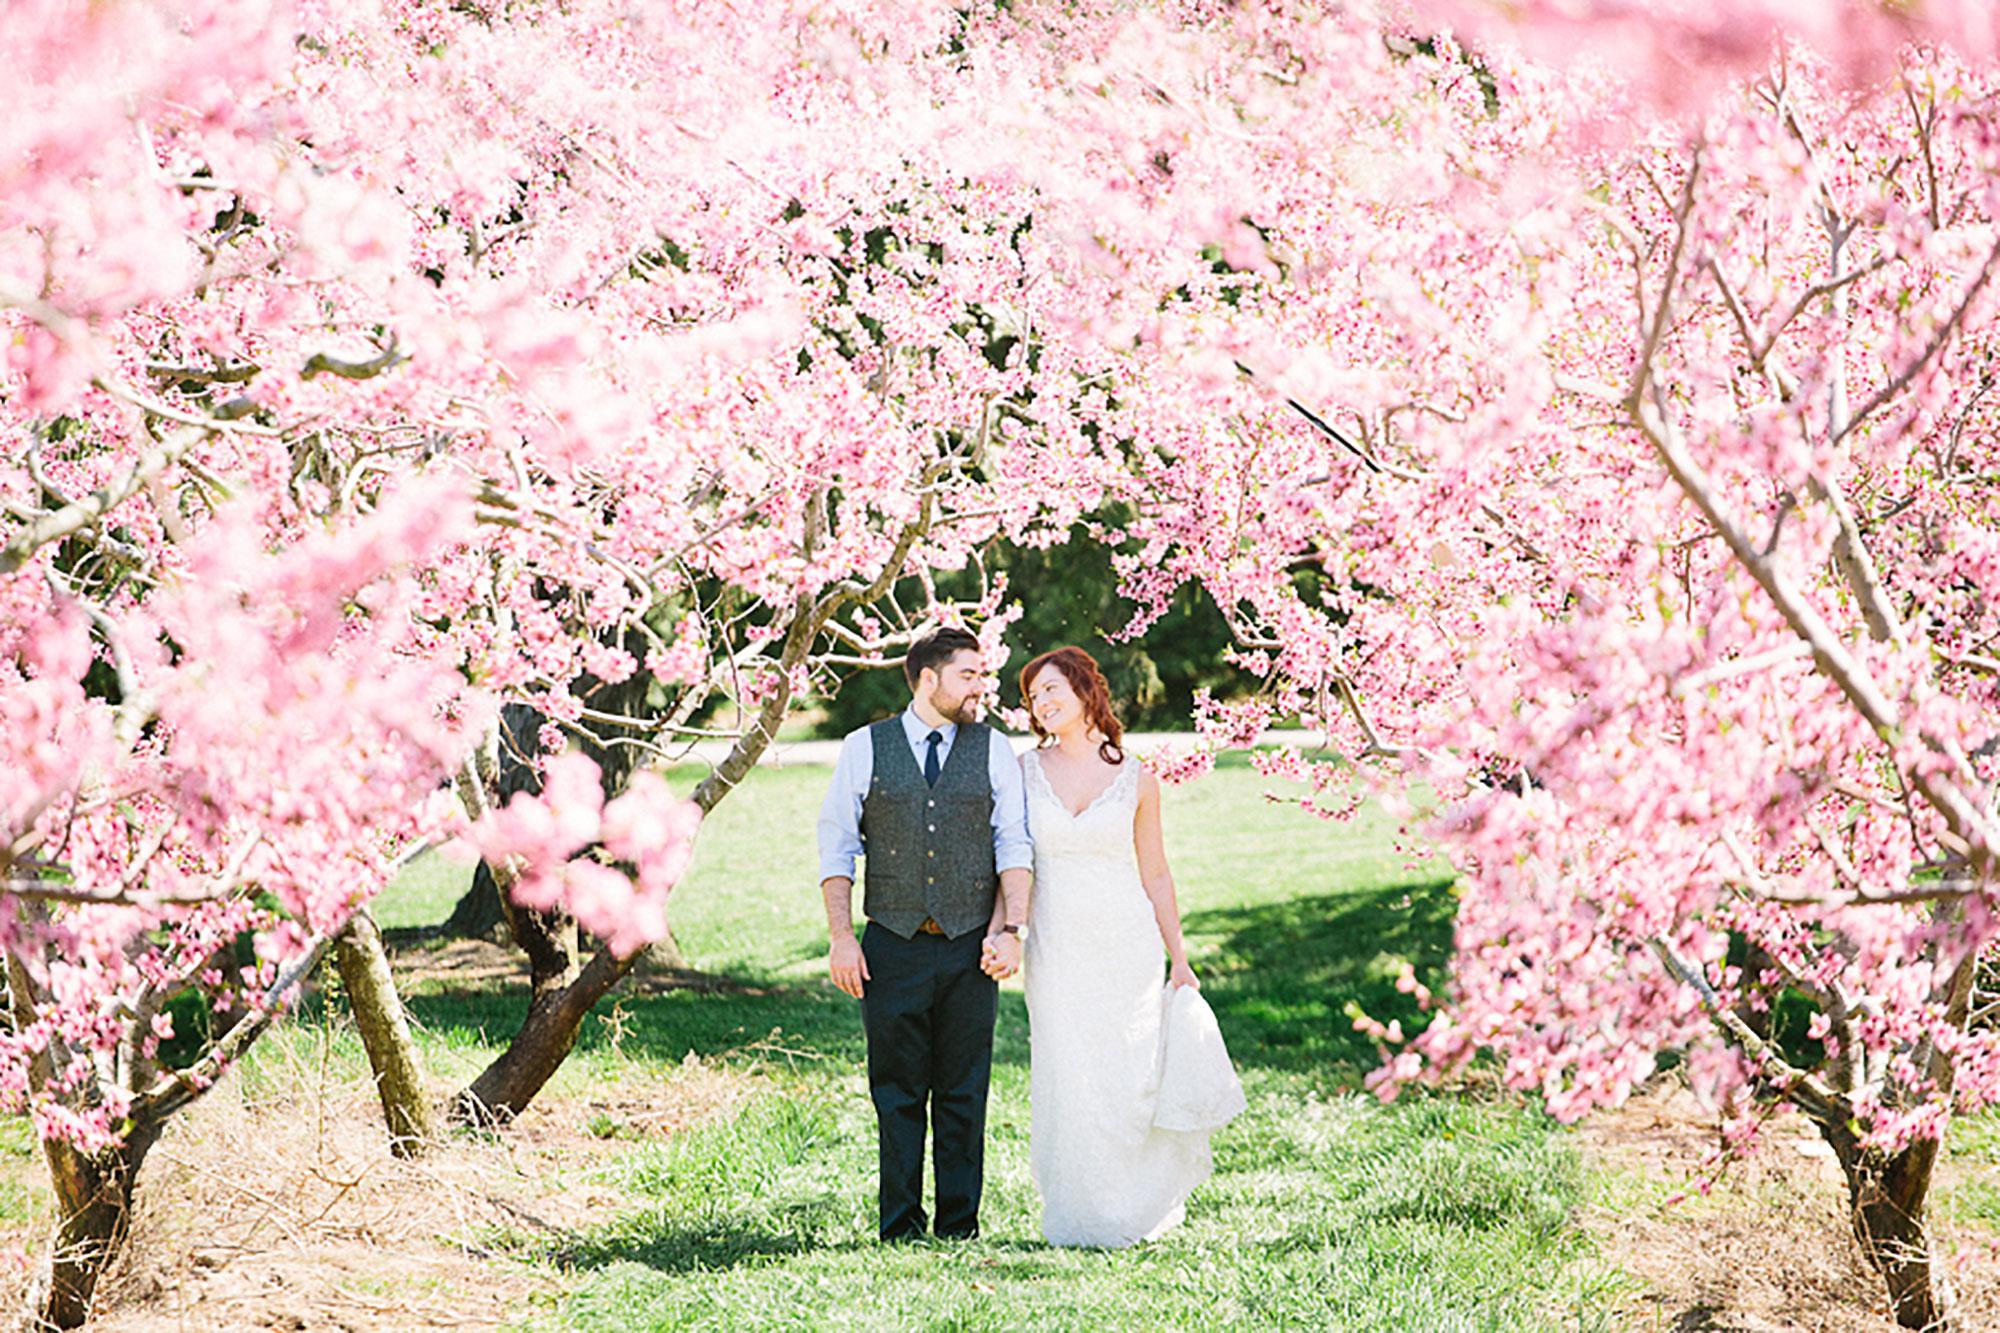 Navy-Hall-Wedding-Vineyard-Bride-Photo-By-Andrew-Mark-Photography-024.jpg